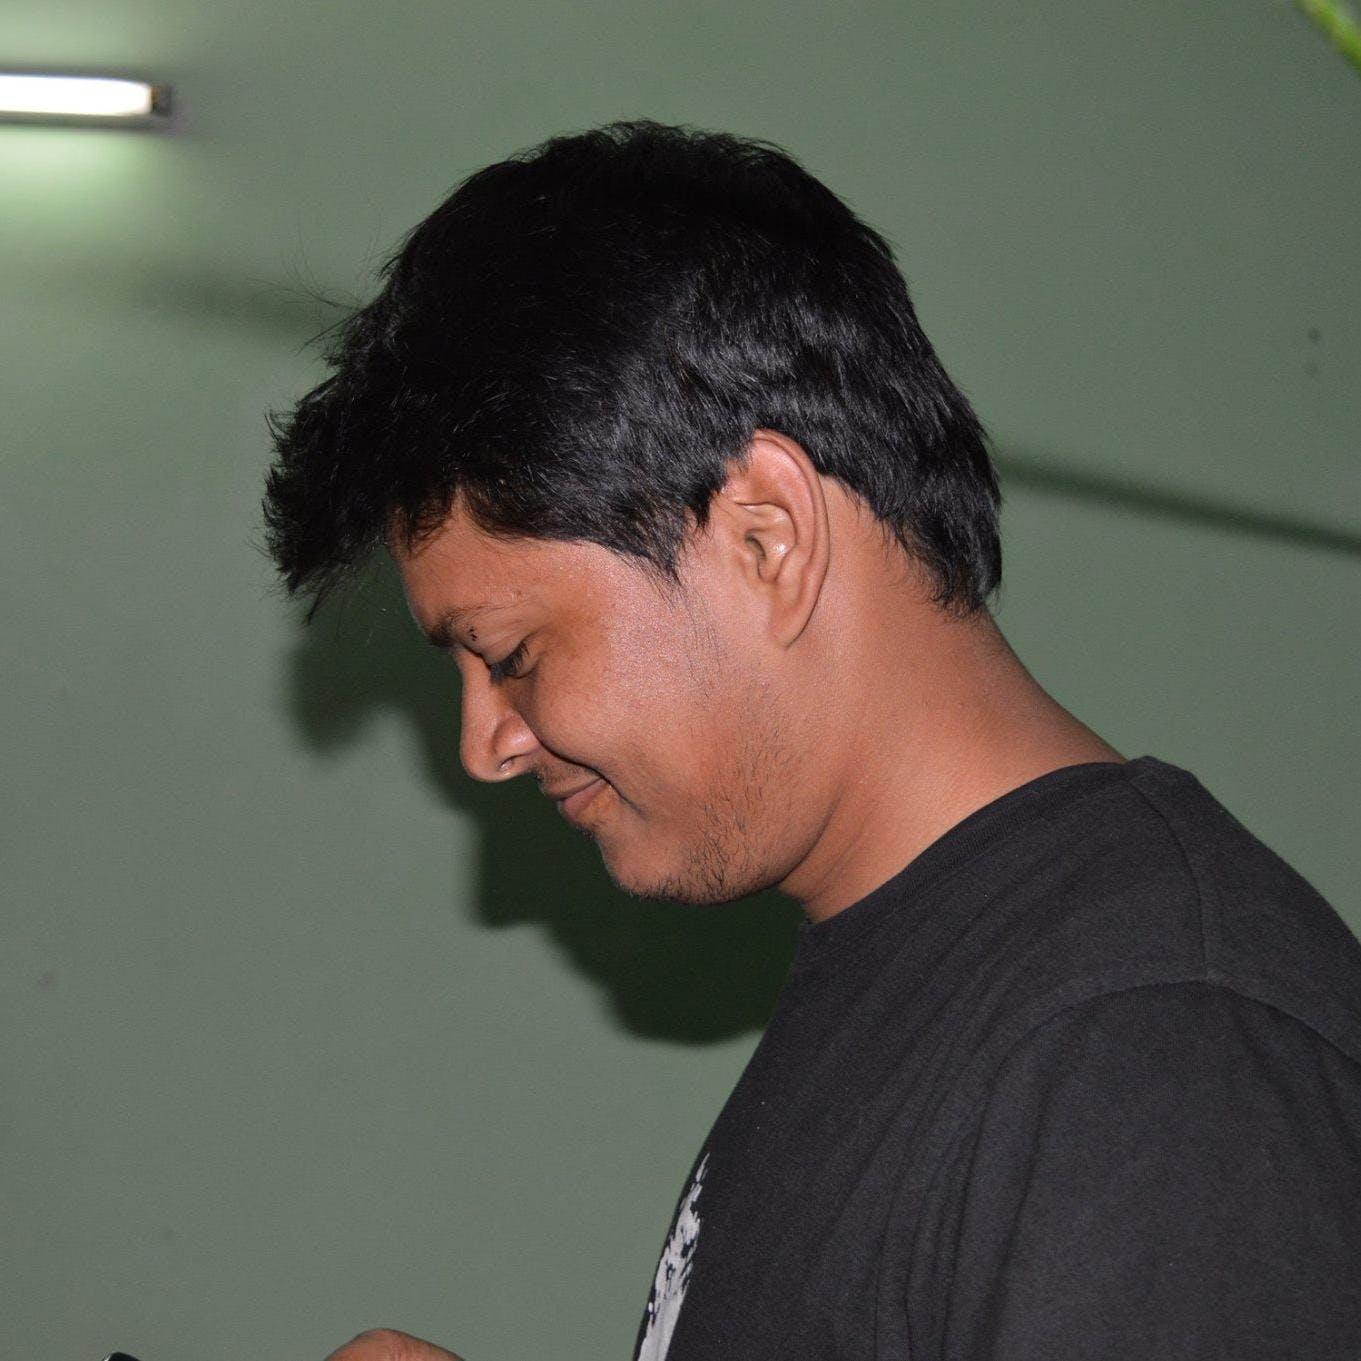 Kaustubh Agarwal